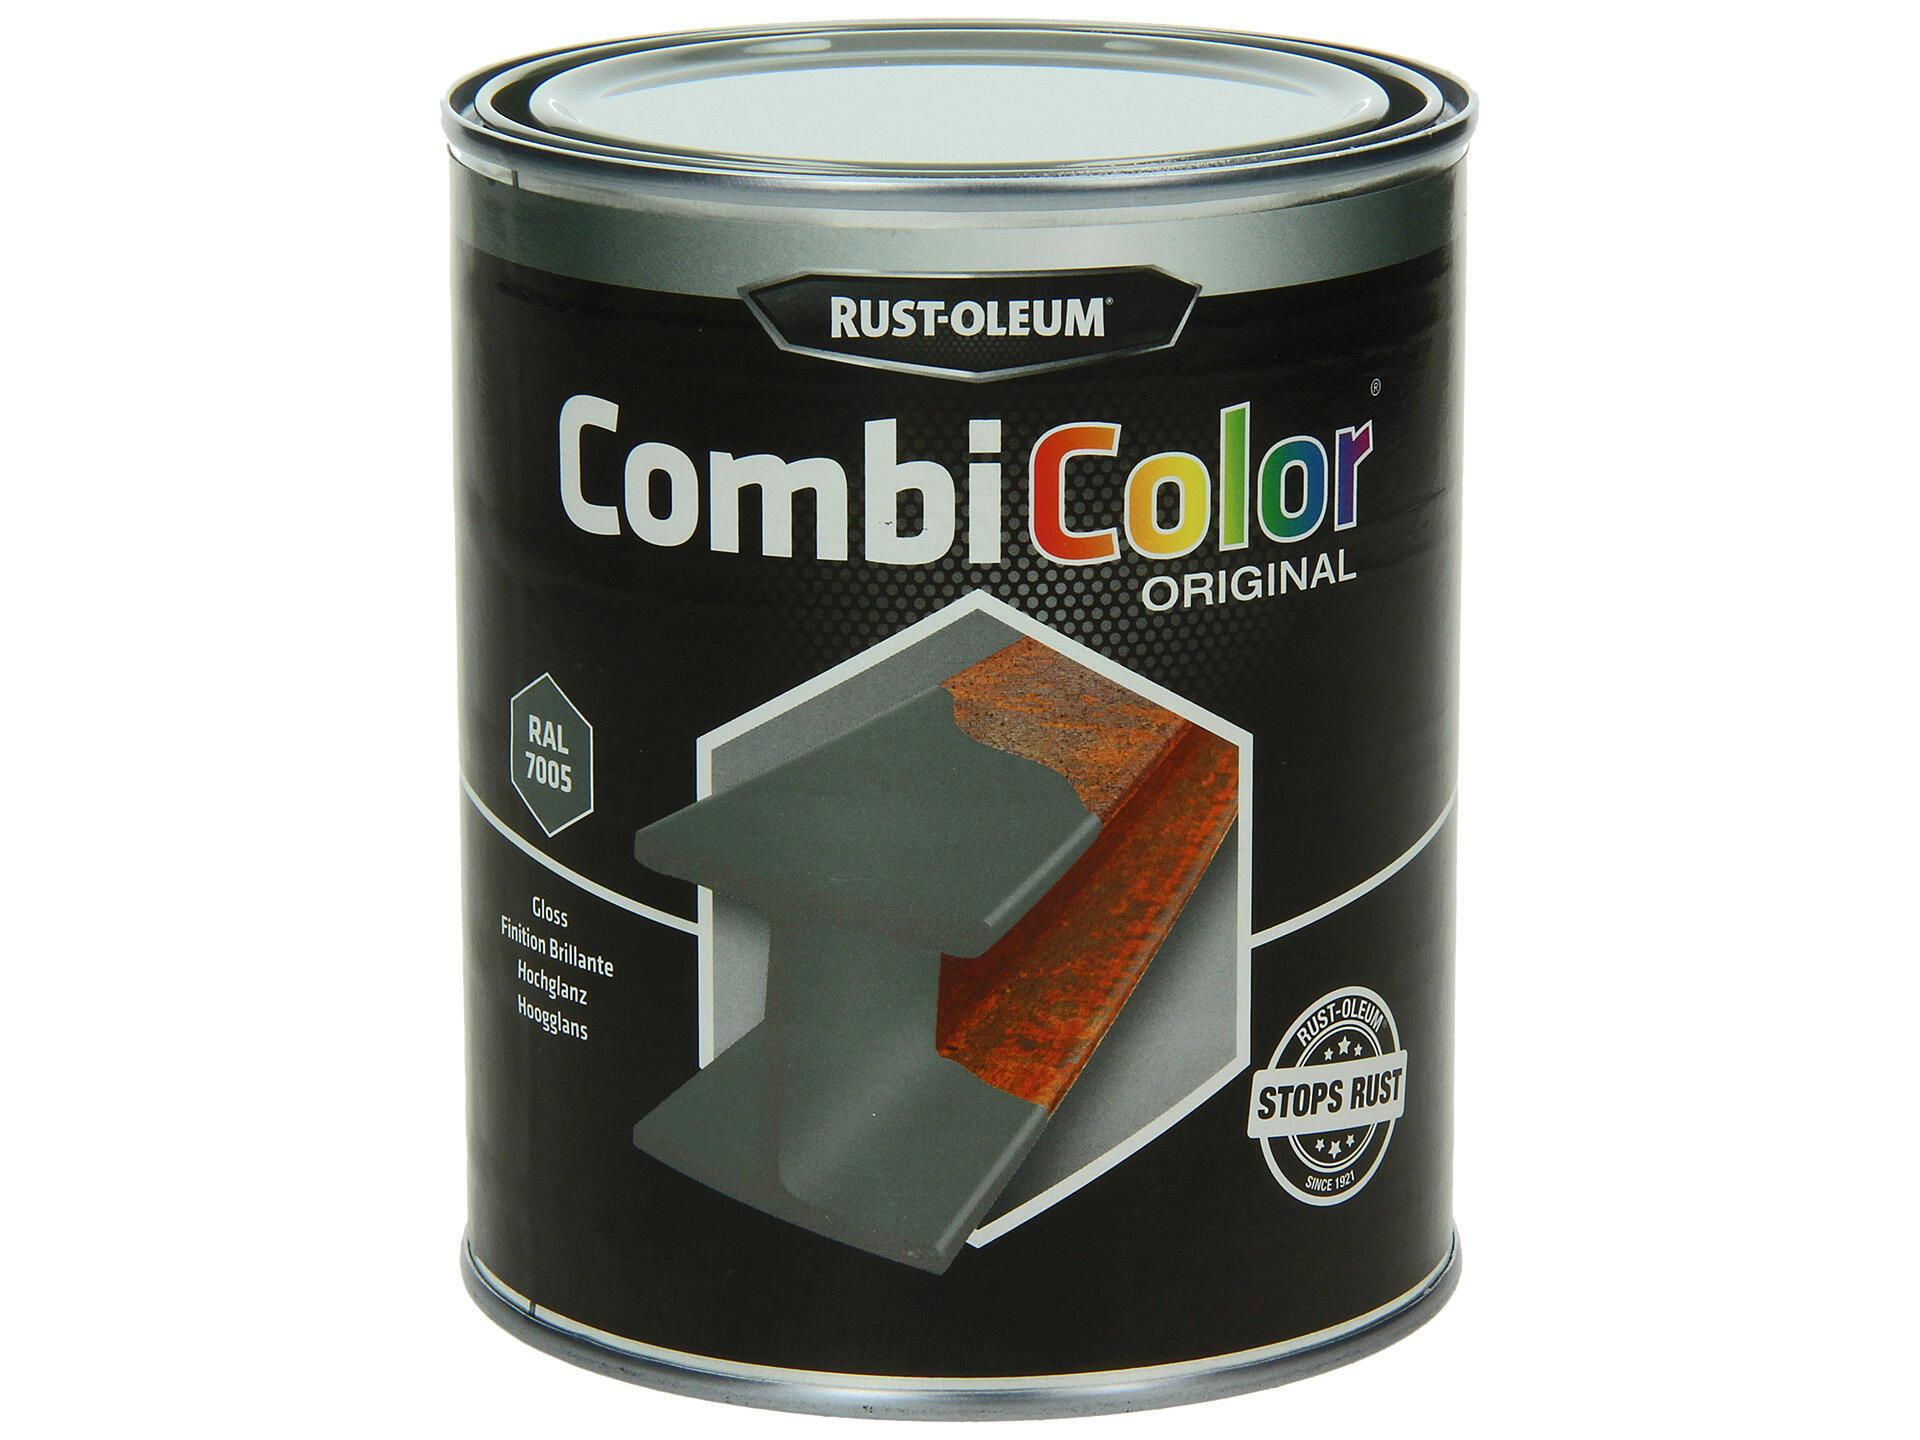 Rust-oleum laque peinture métal brillant 0,75l gris souris   Hubo